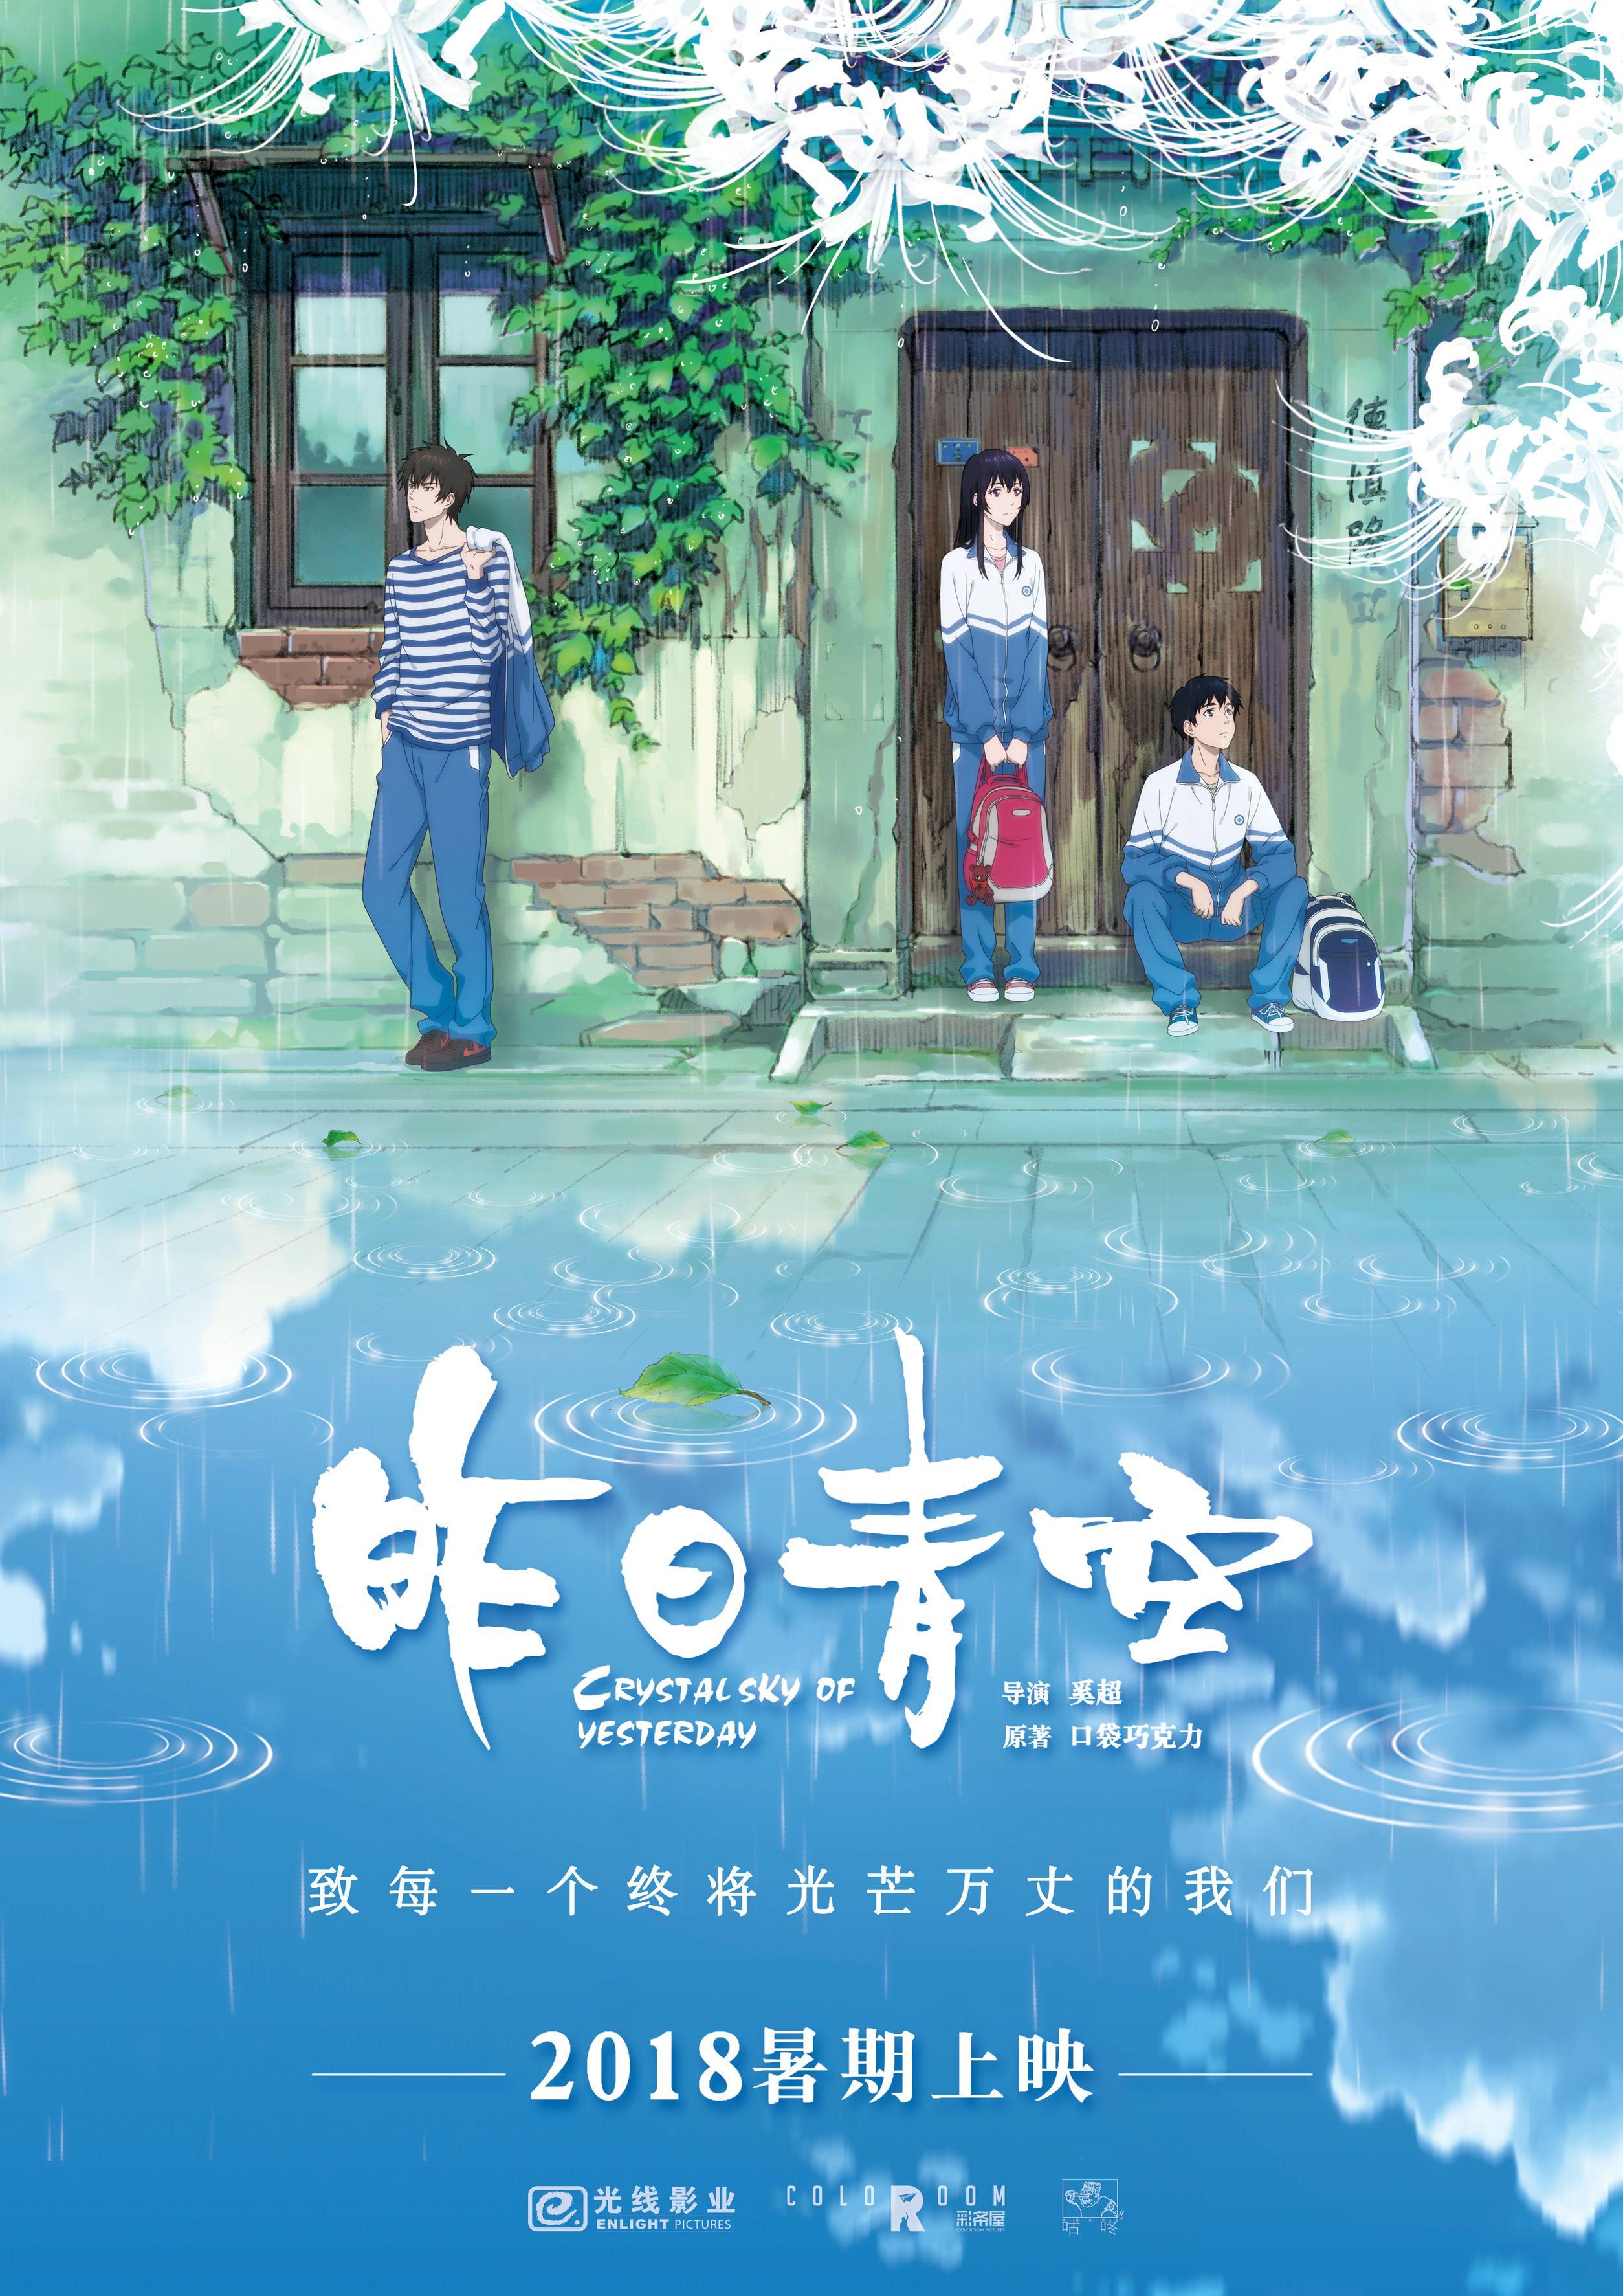 Pin by . lemon on 01手绘风 in 2020 Anime, Yesterday movie, Sky